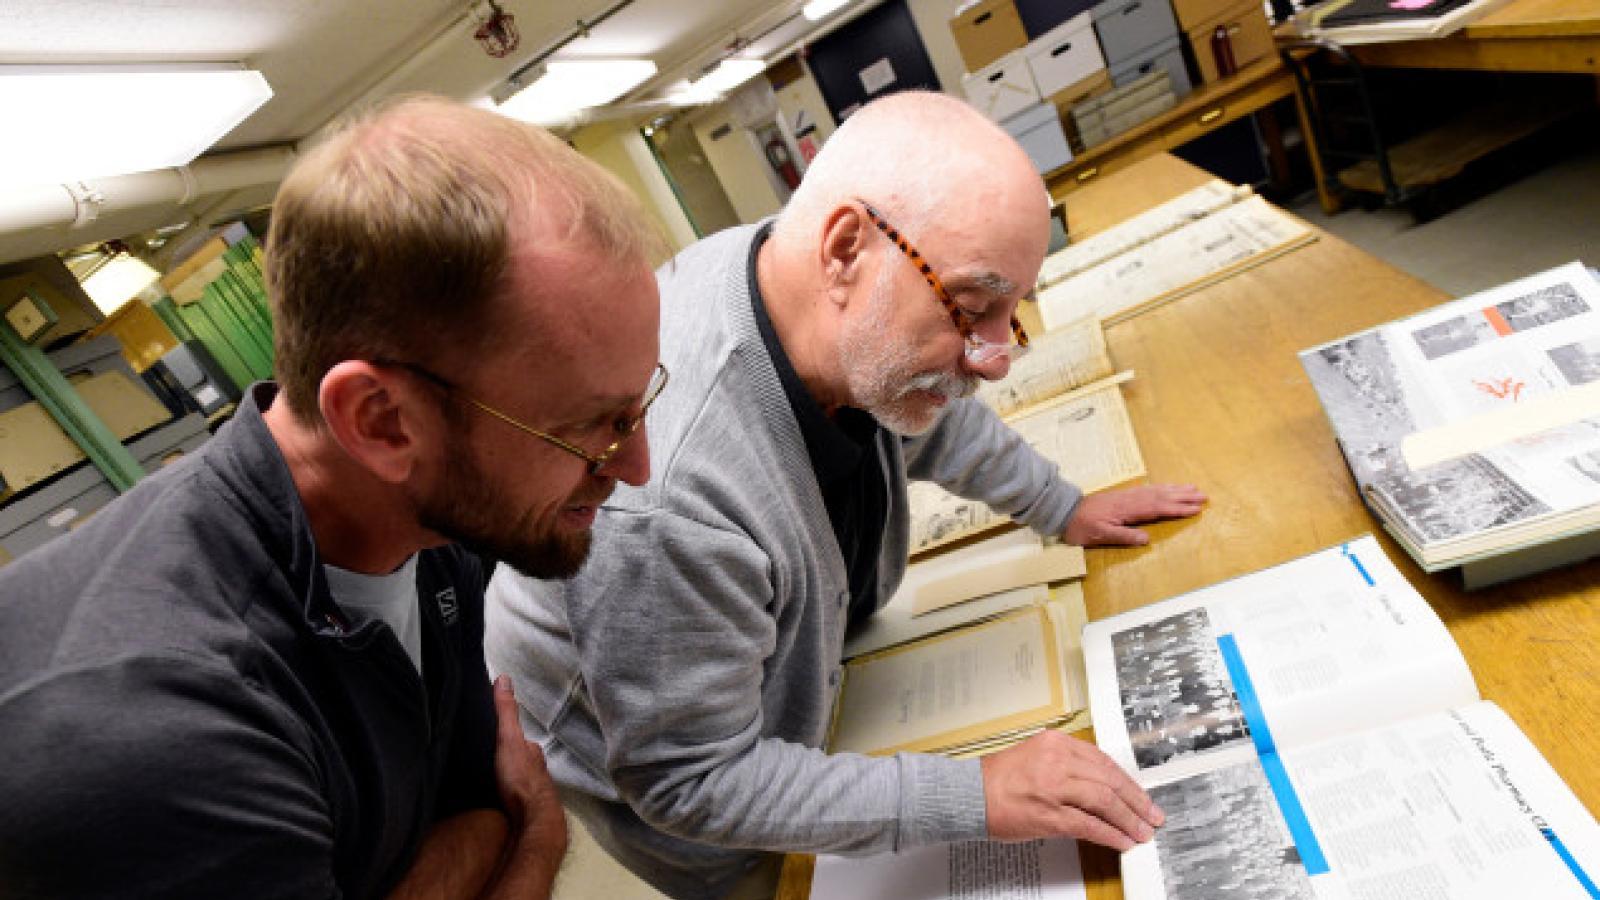 Adam Lisbon and David Hays. Photo taken by Boulder Daily Camera